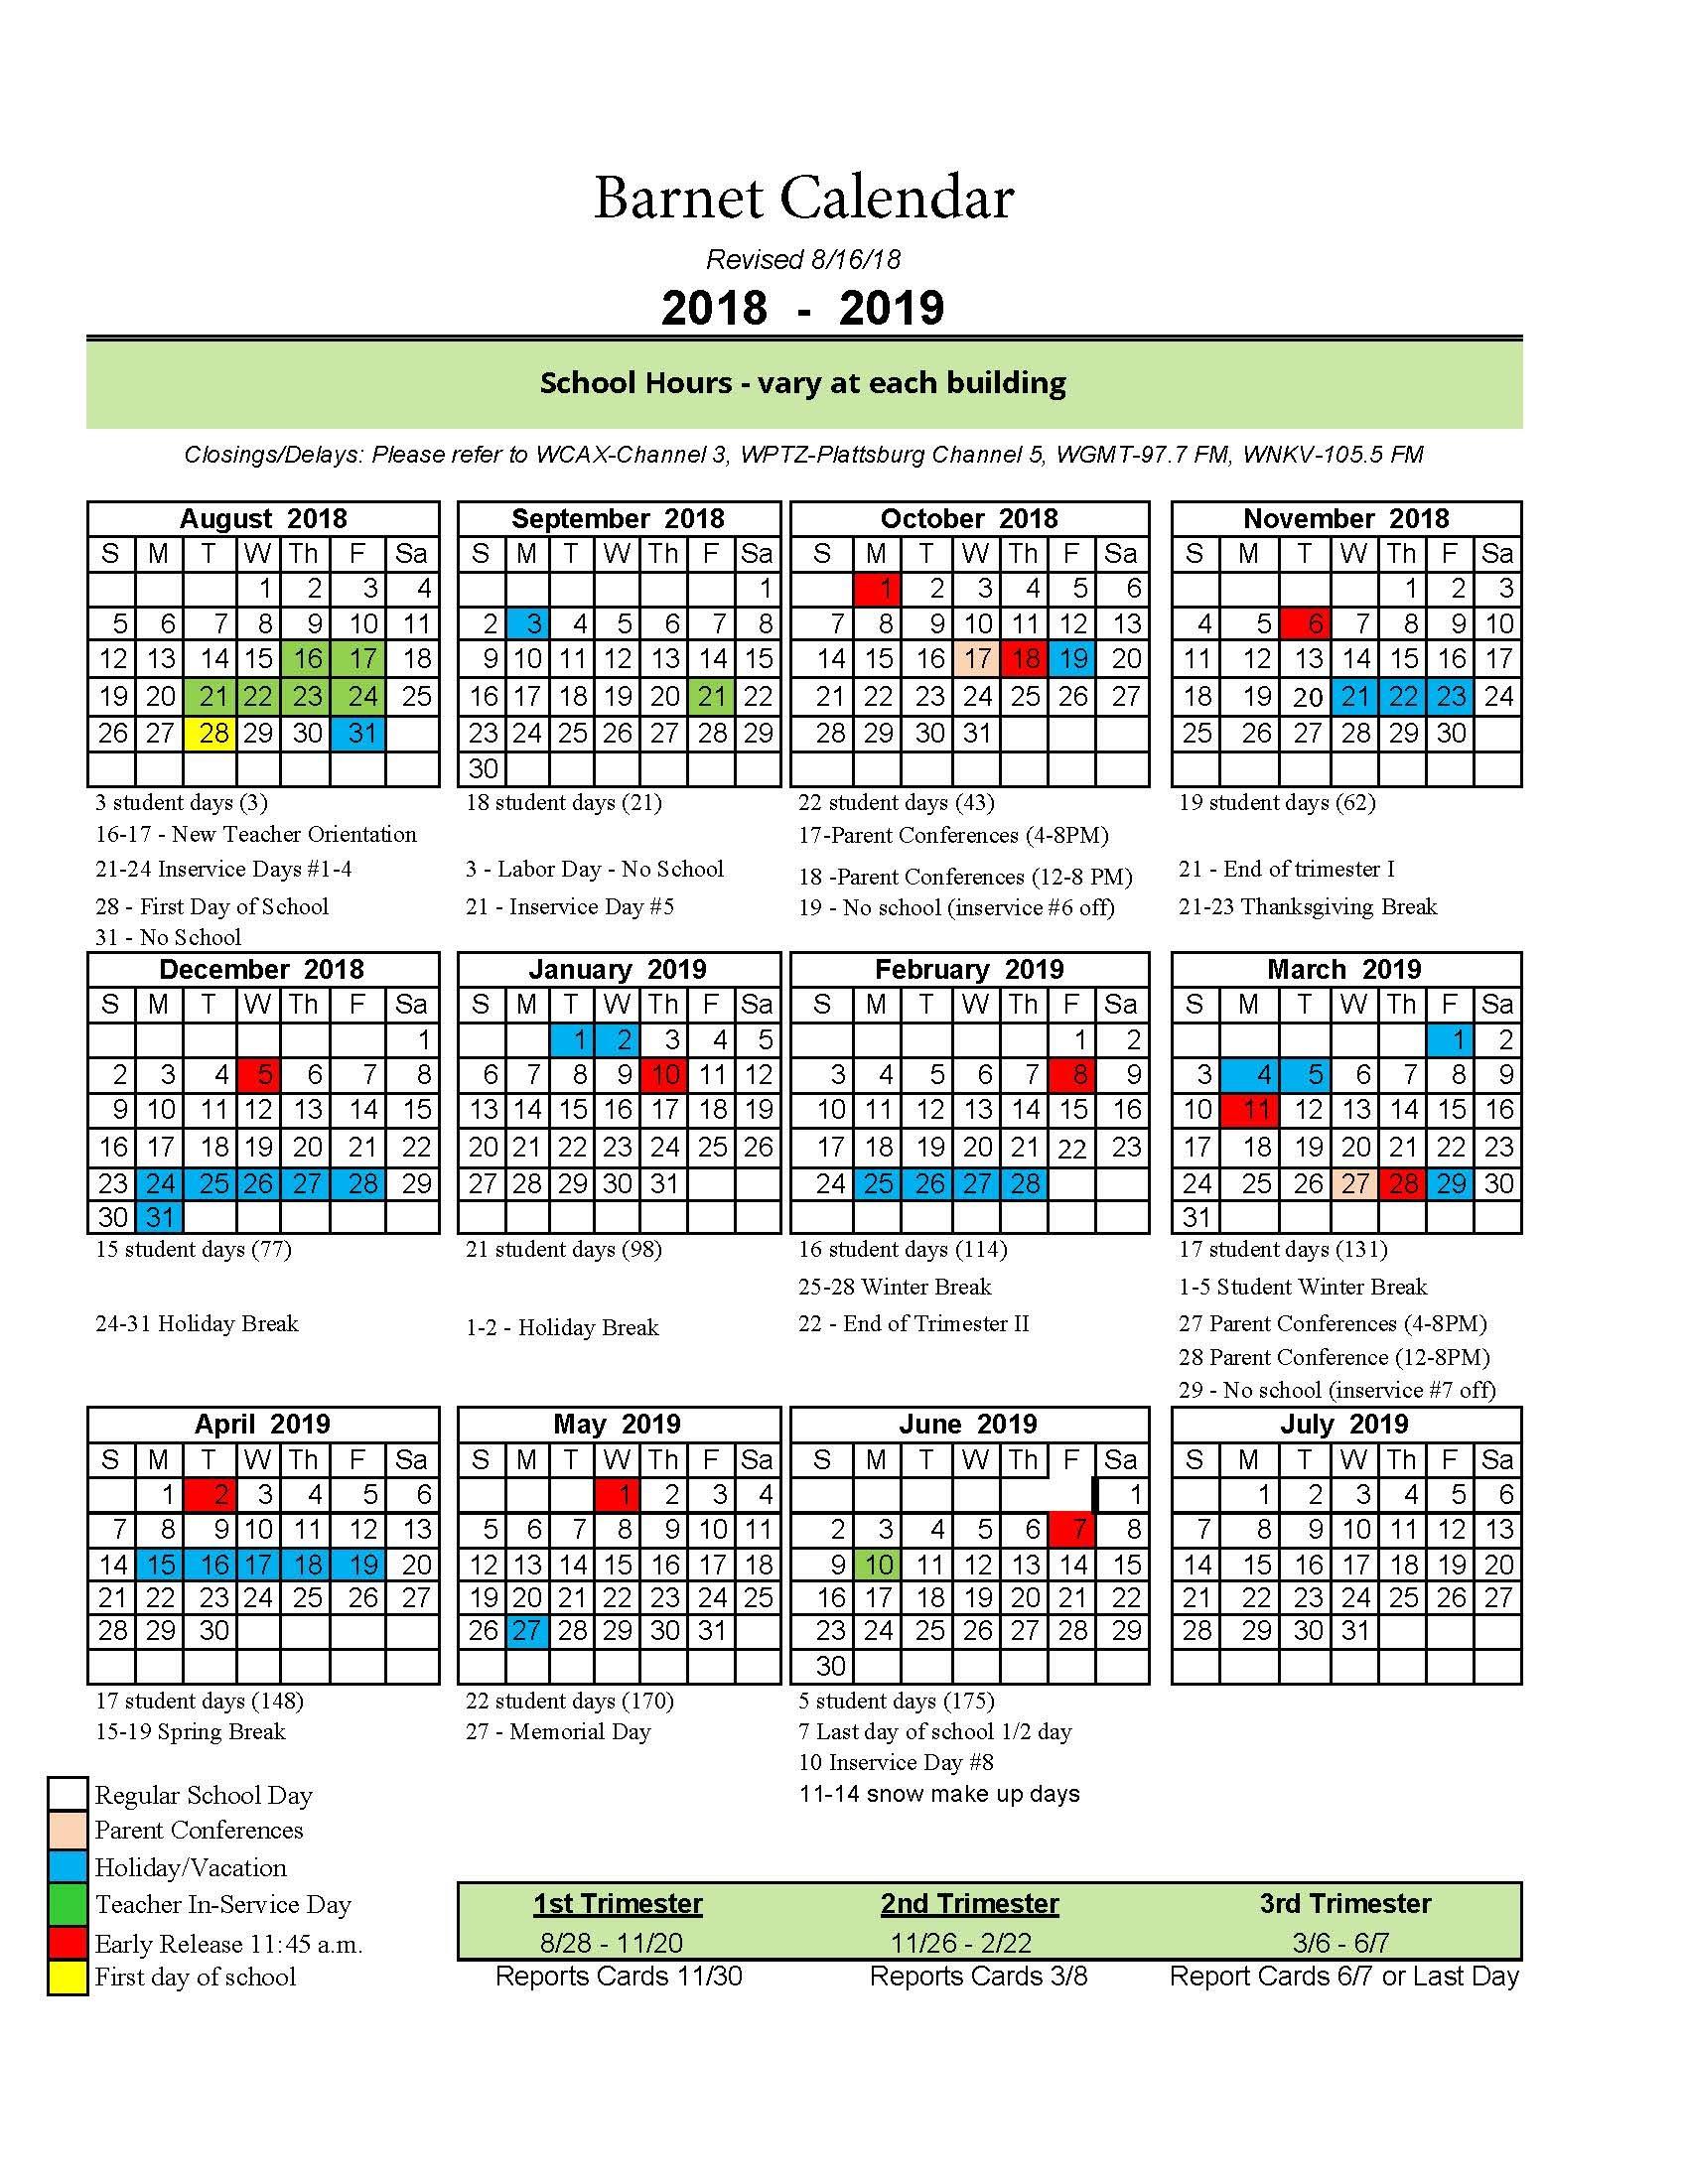 2018 19 school calendar